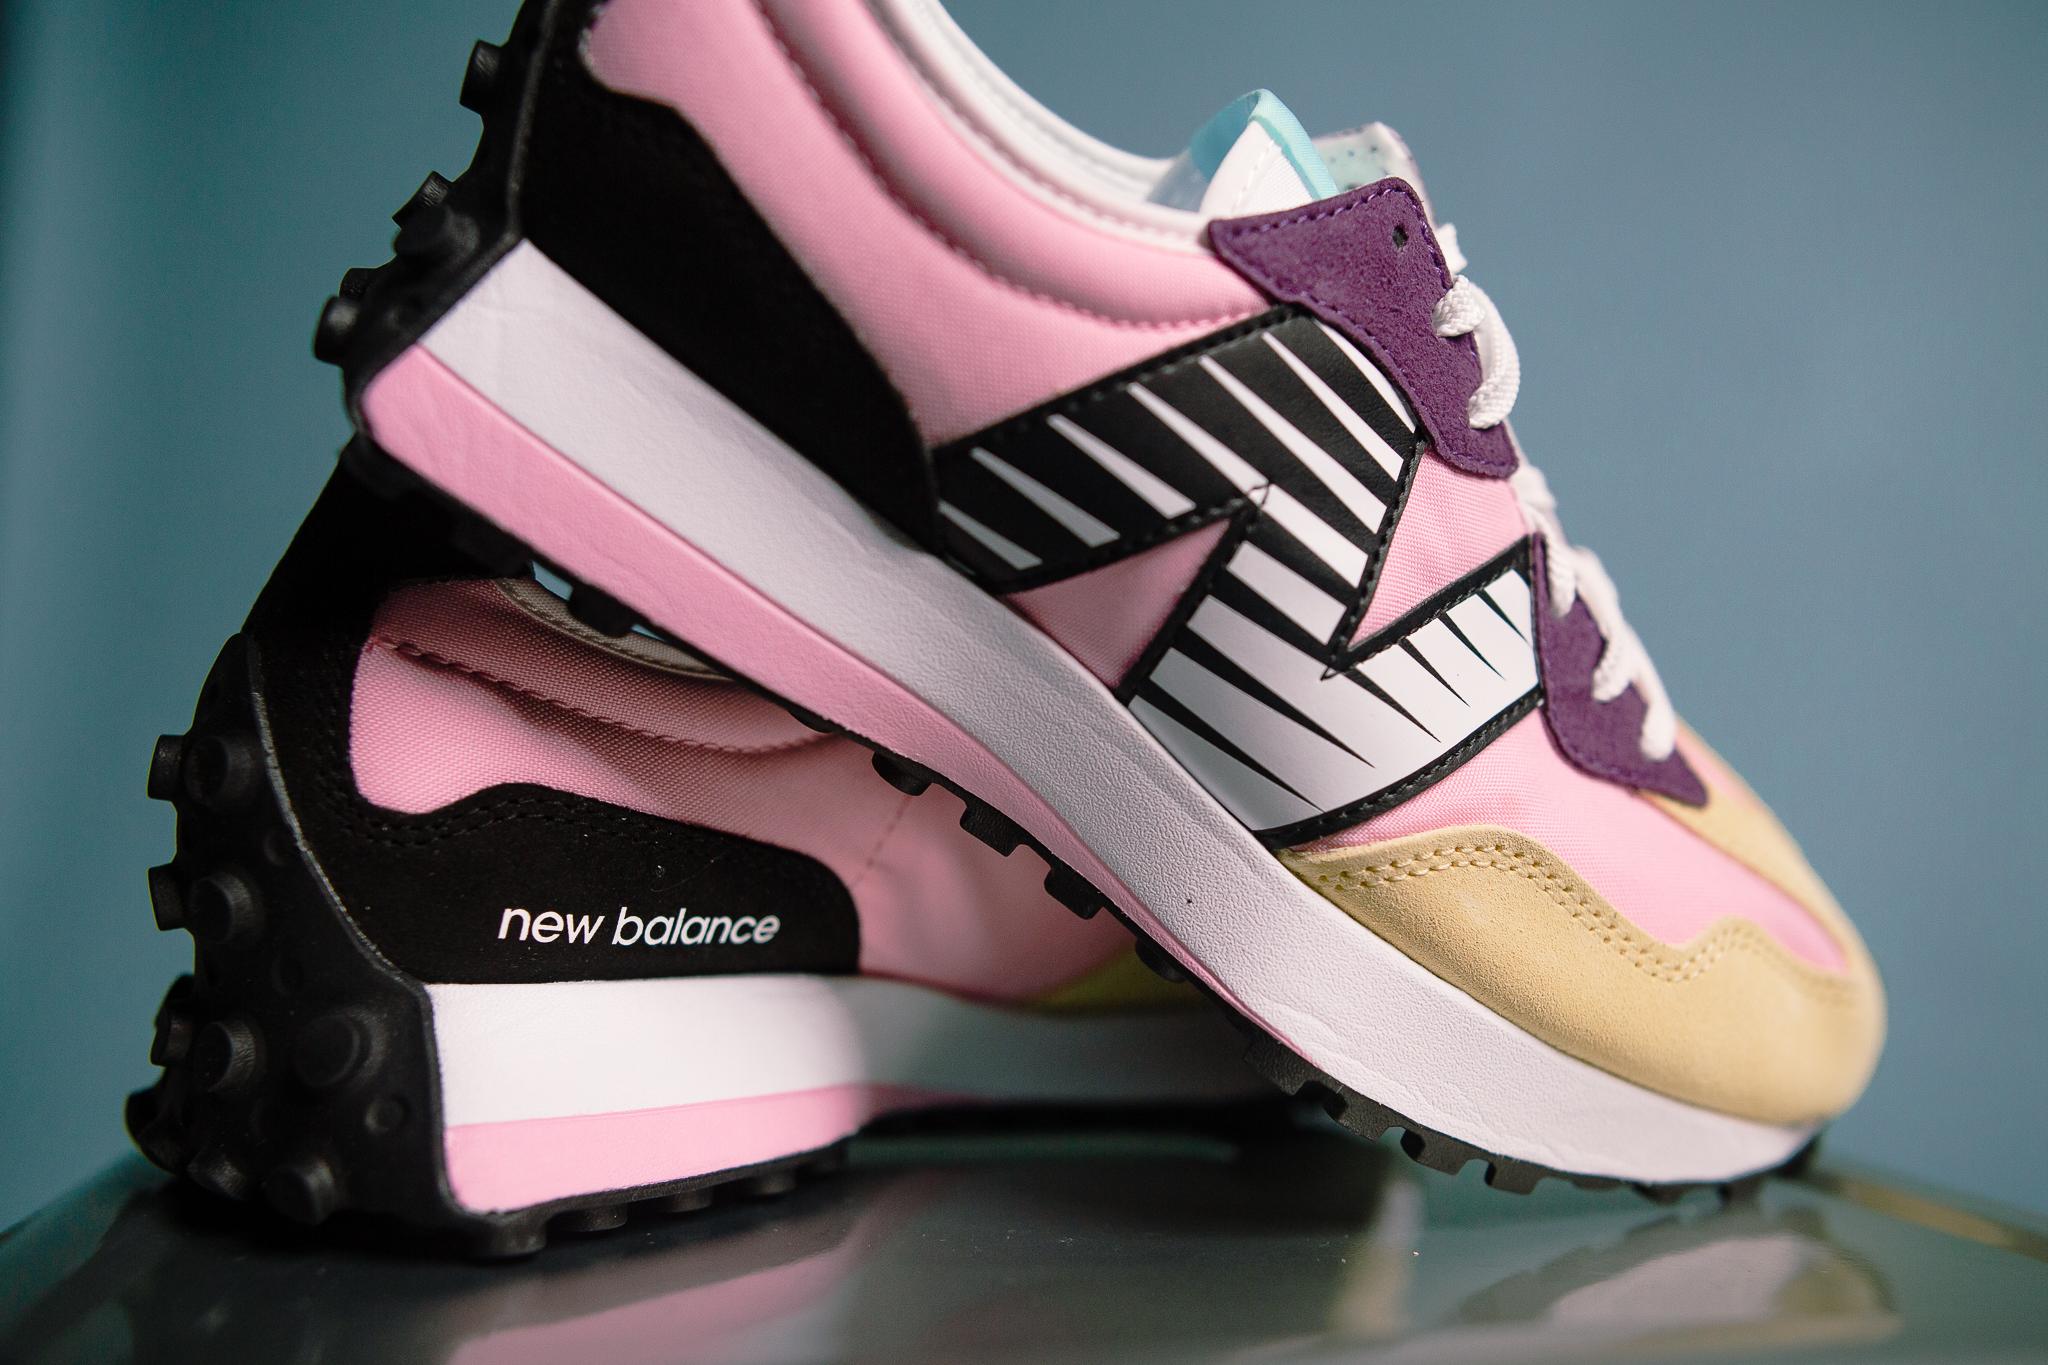 New Balance x Foot Locker - NB Collective